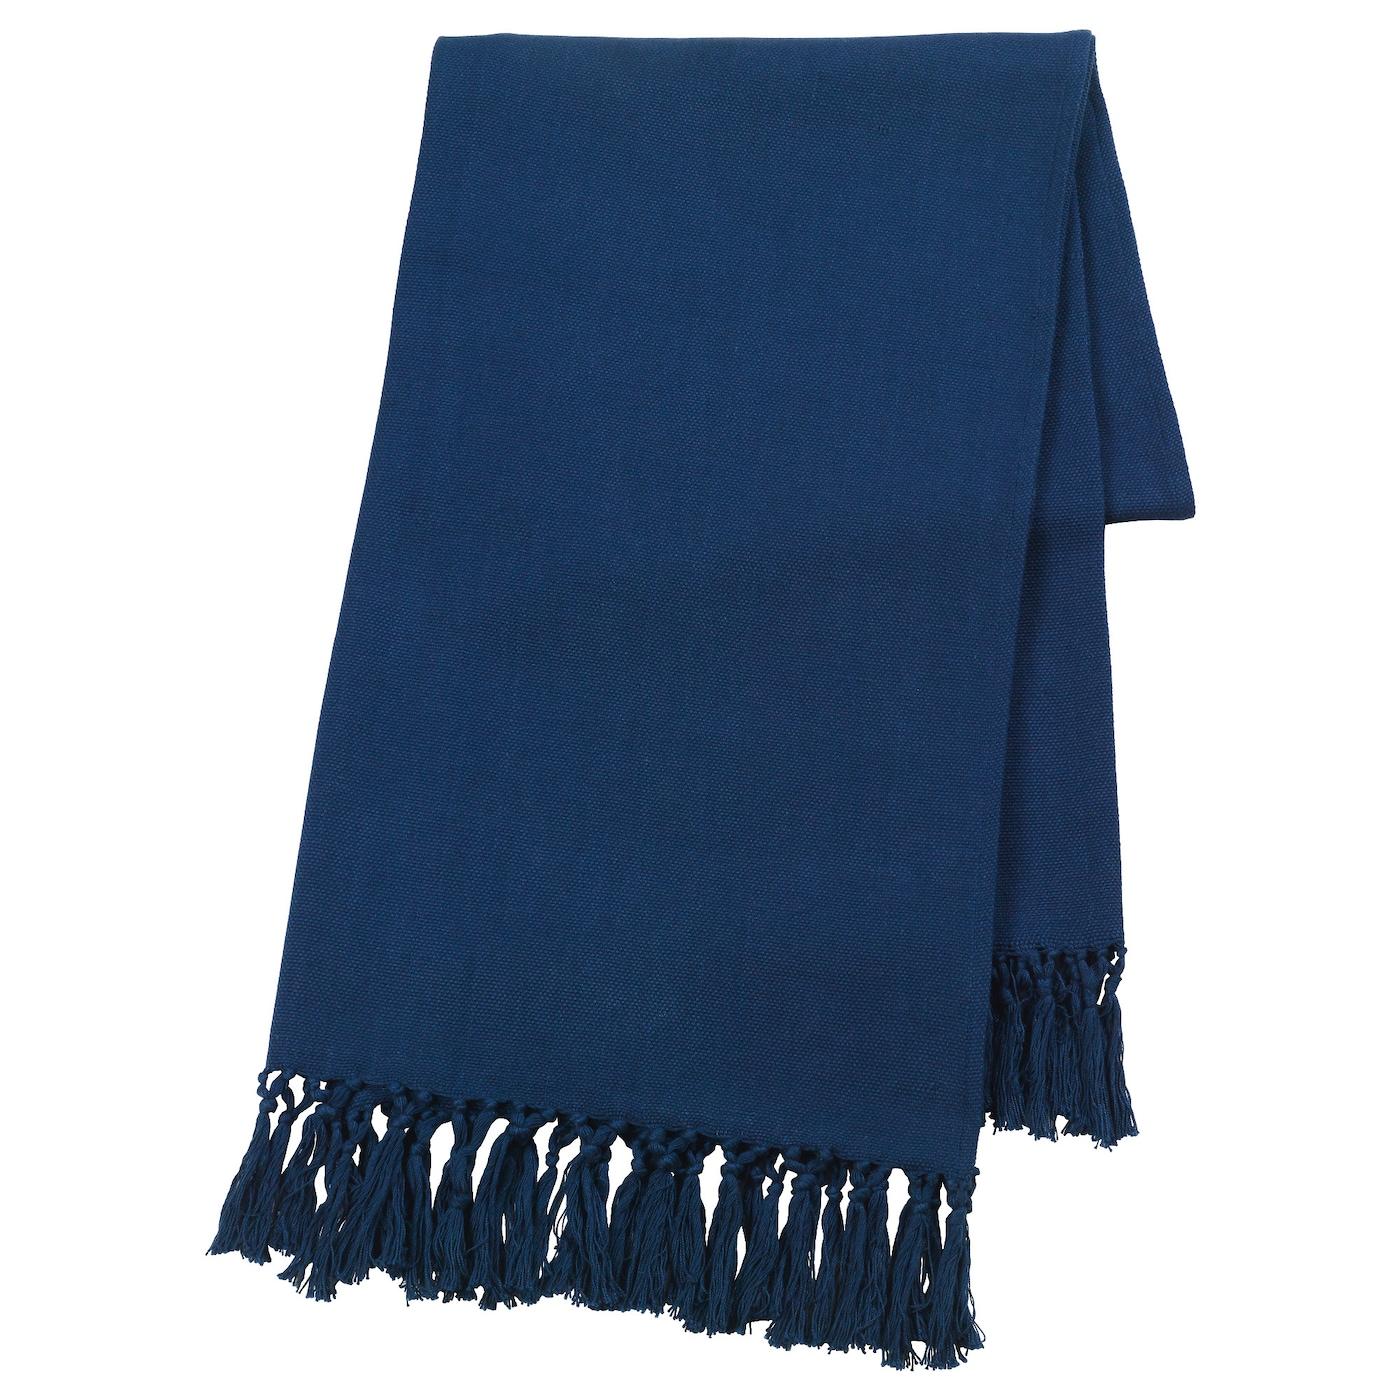 inneh llsrik housse de coussin fait main bleu 65x65 cm ikea. Black Bedroom Furniture Sets. Home Design Ideas